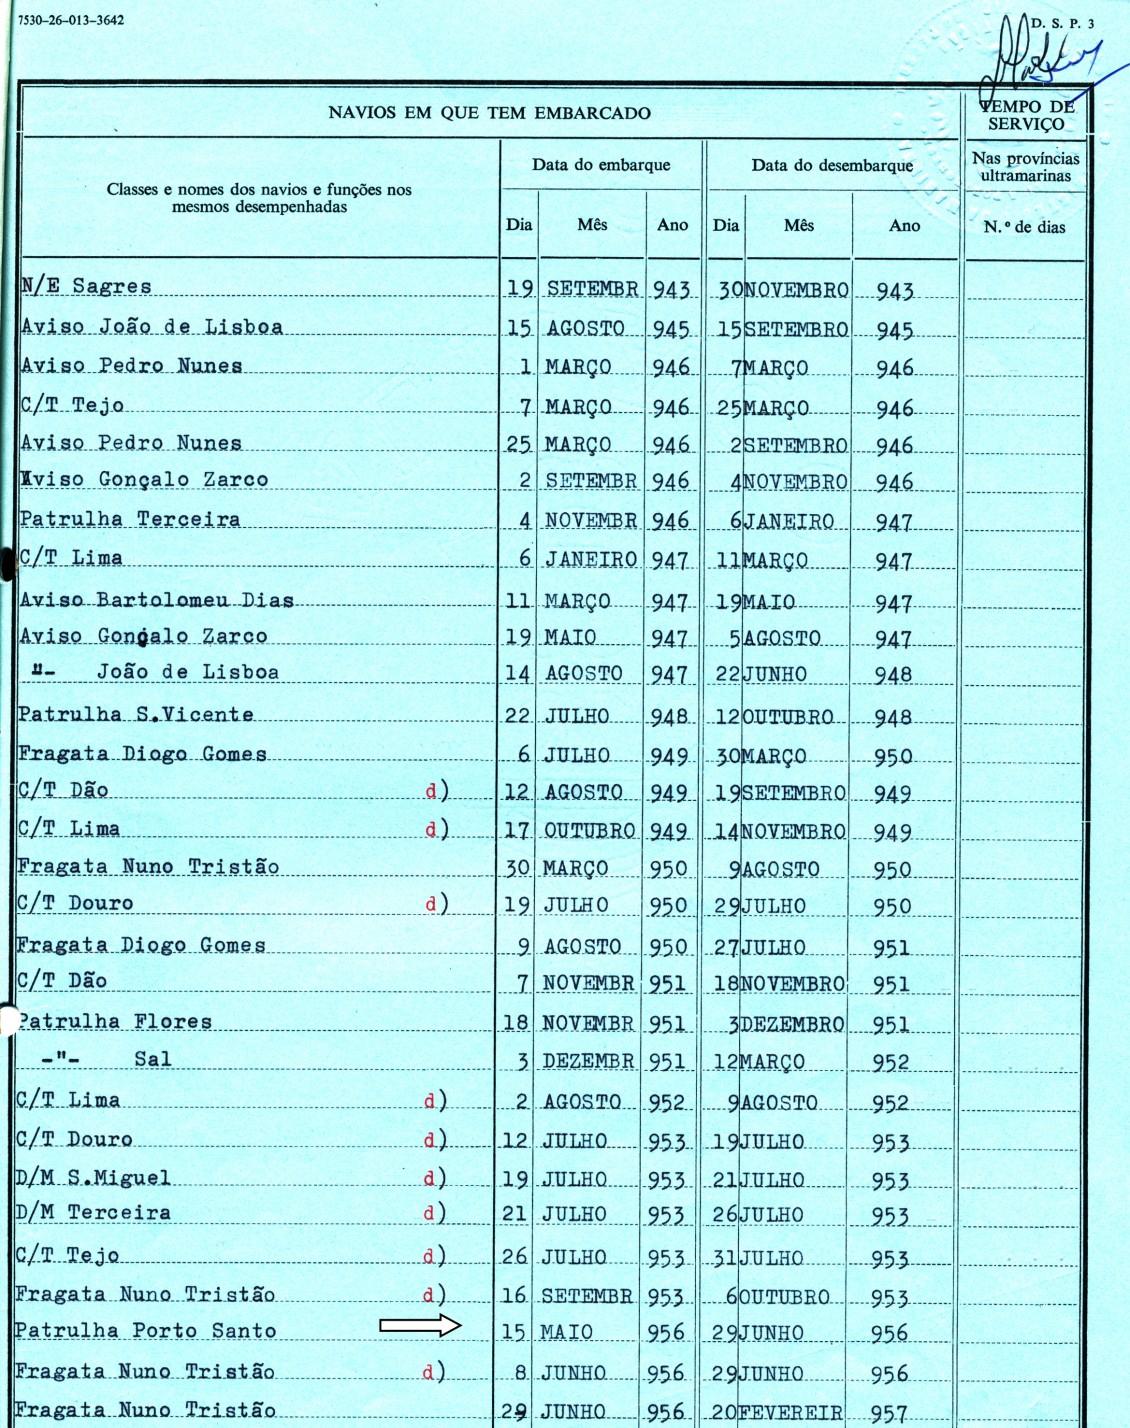 00294 956-05-15 imediato do Patrulha Porto Santo